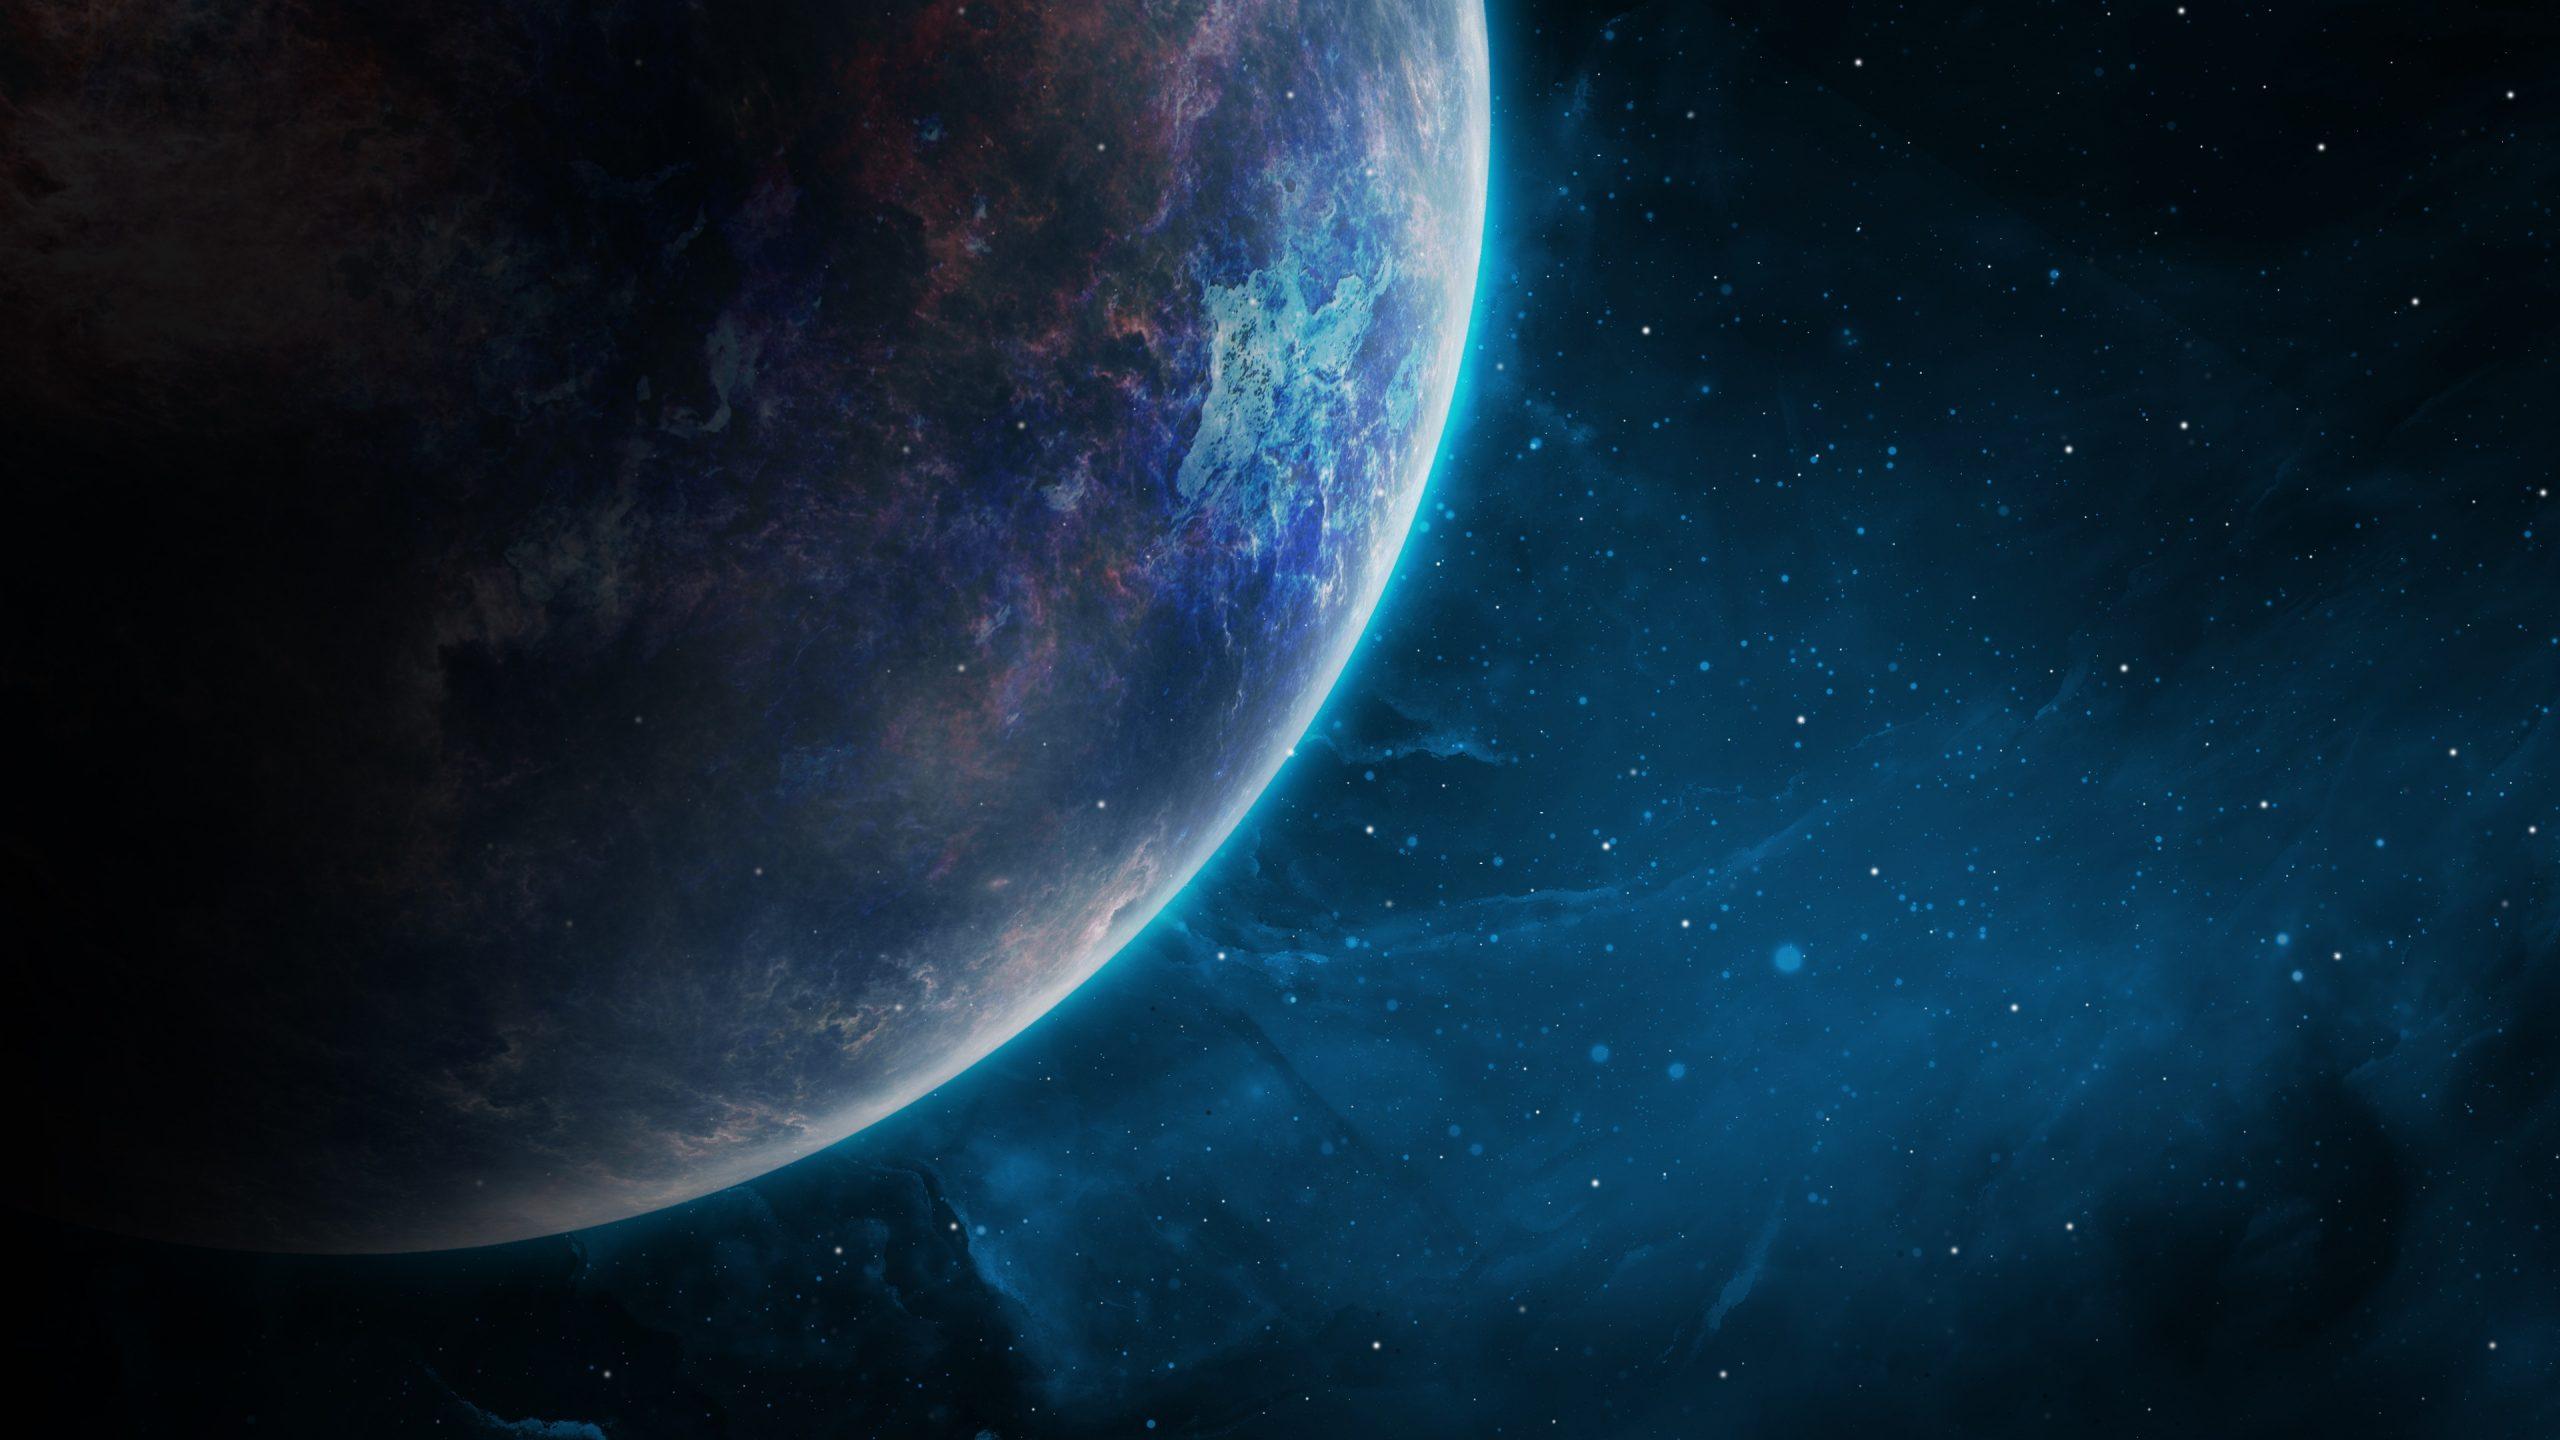 Blue Planet 4k Space Galaxies Wallpaper 4k 2053336 Hd Wallpaper Backgrounds Download